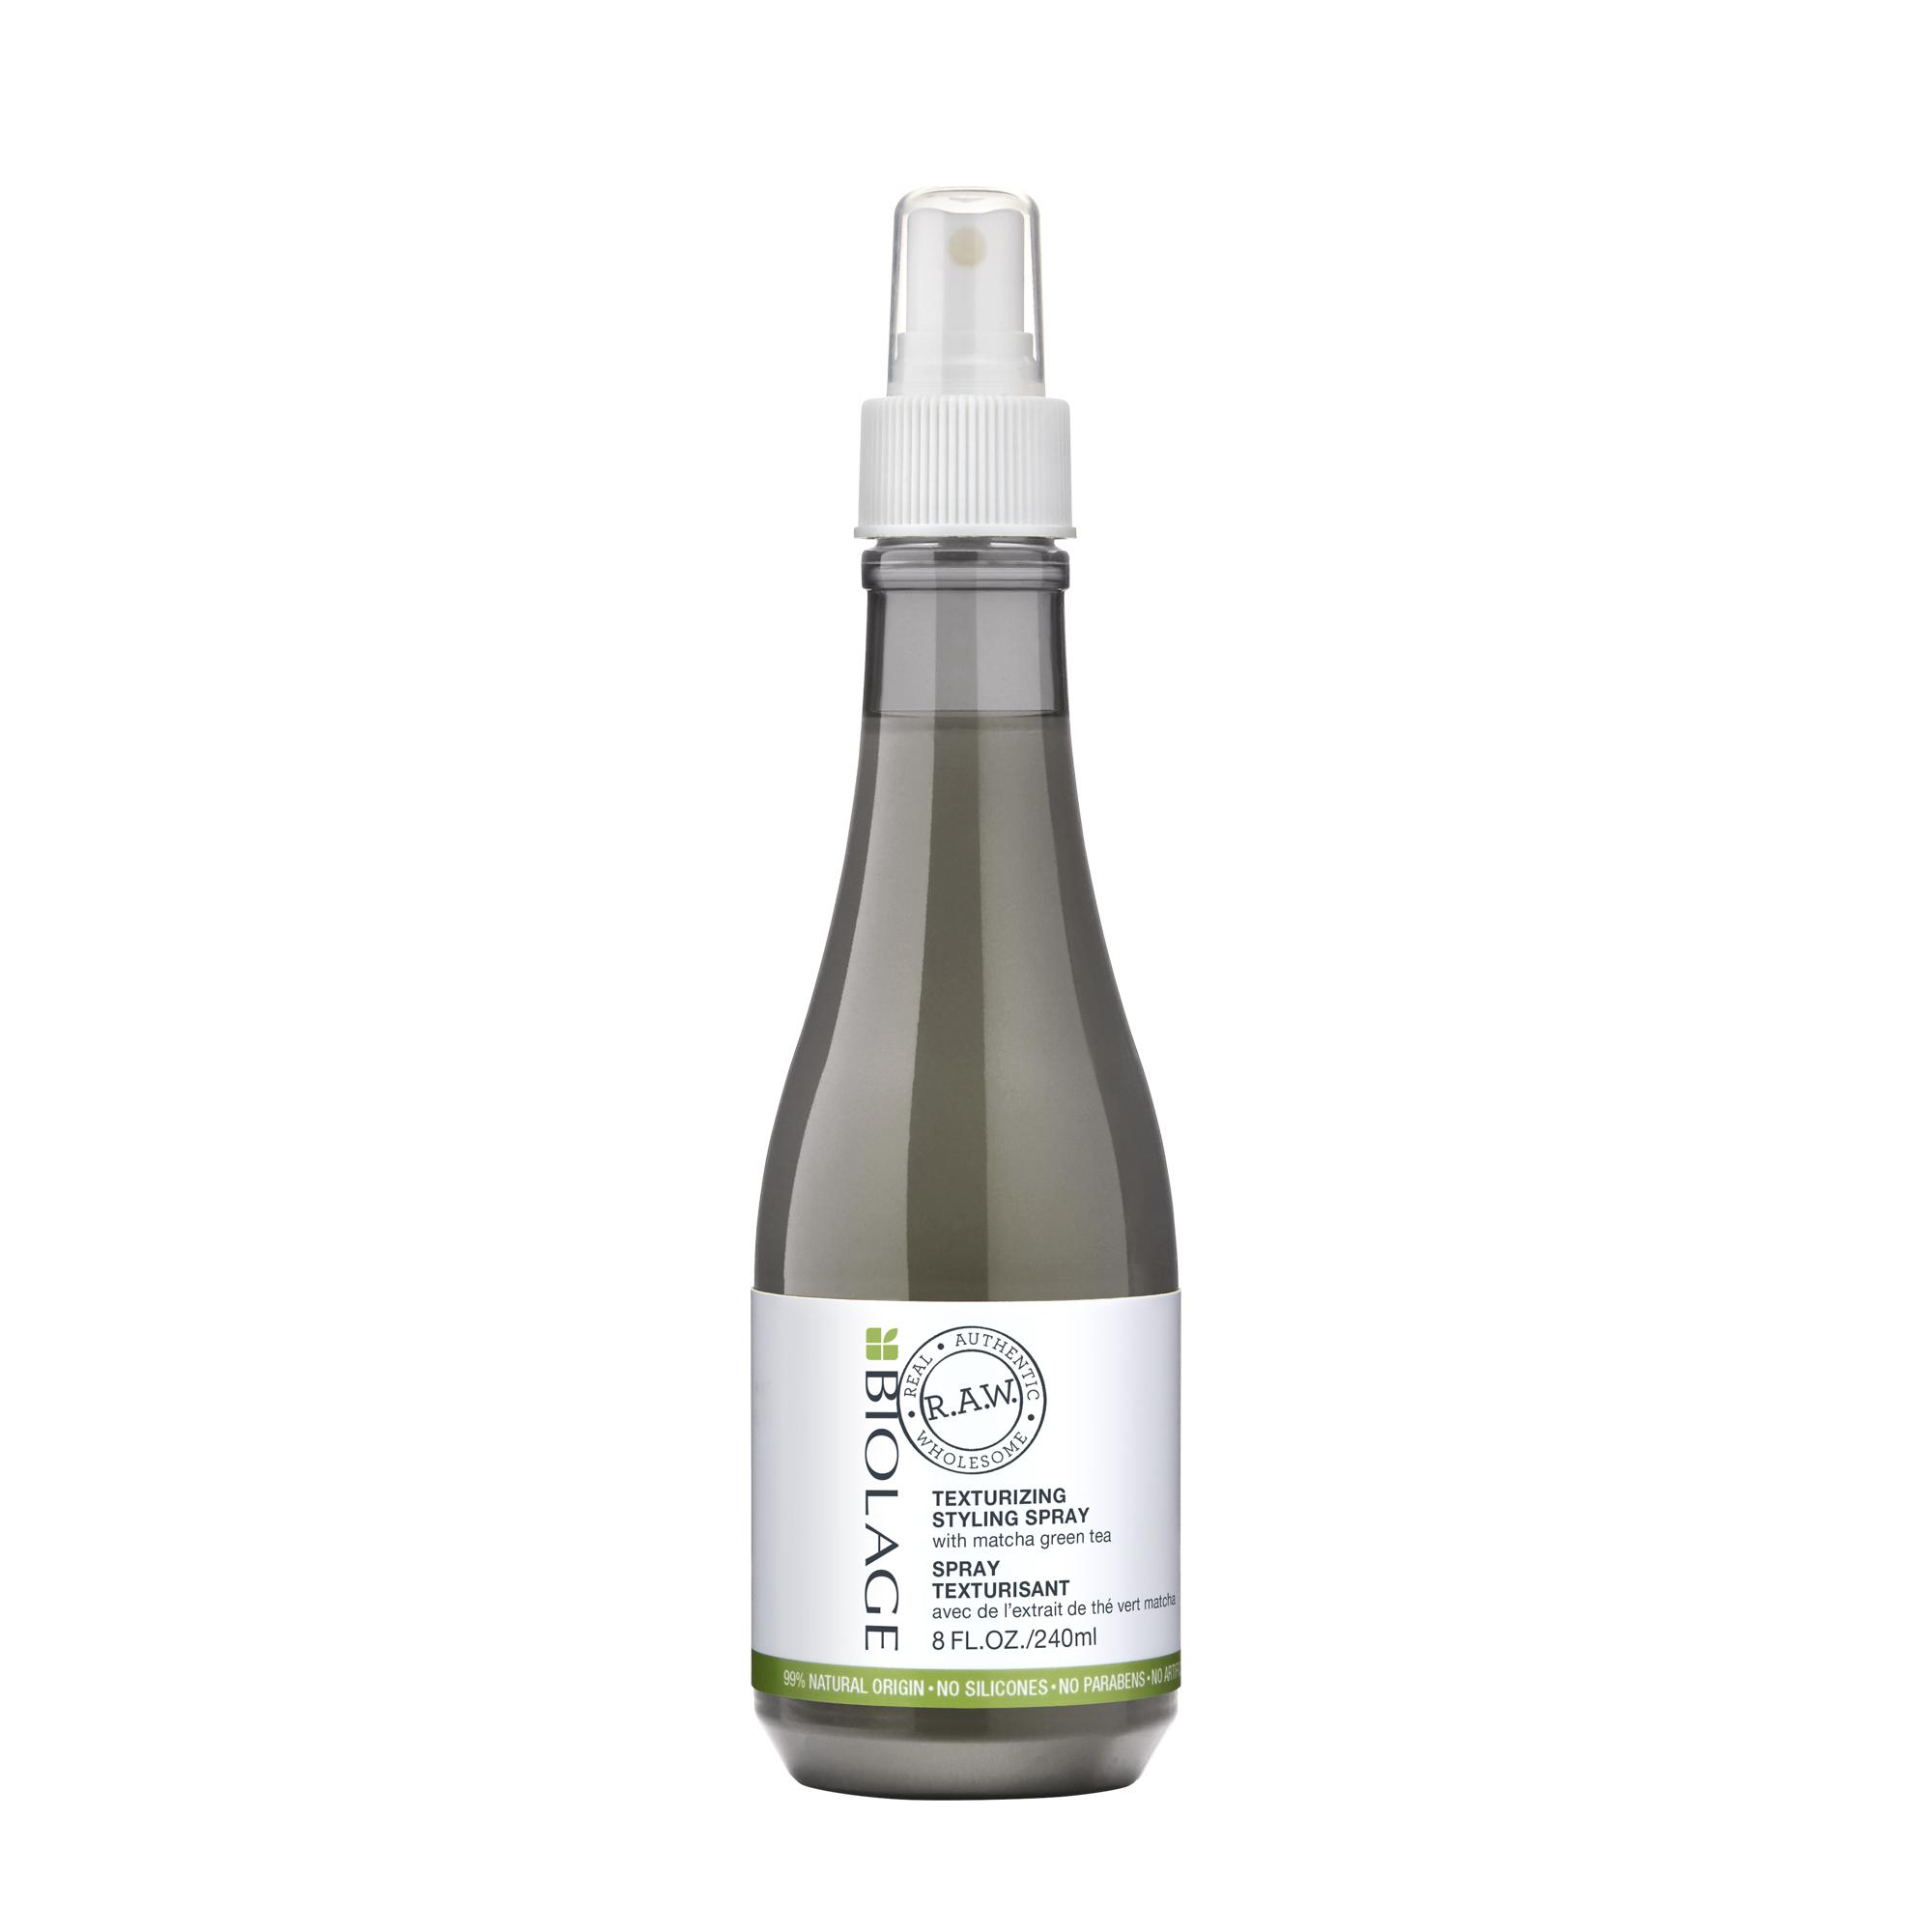 Texturizing Styling Spray 240ml